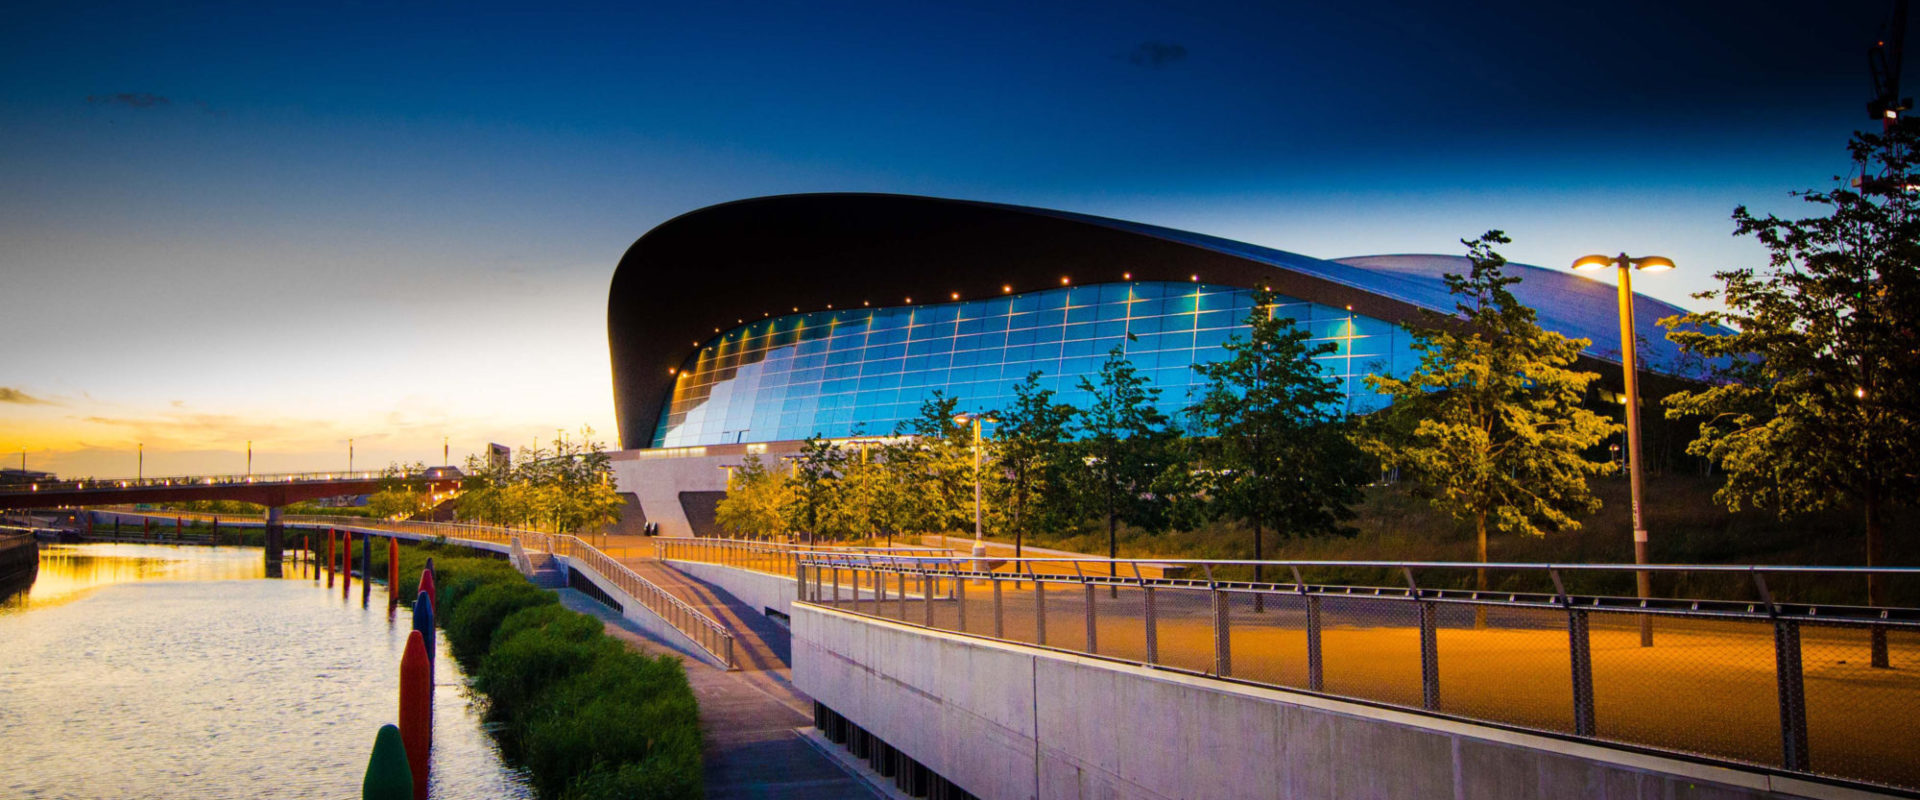 Photograph of the London Aquatics Centre, Olympic park, Startford, East London